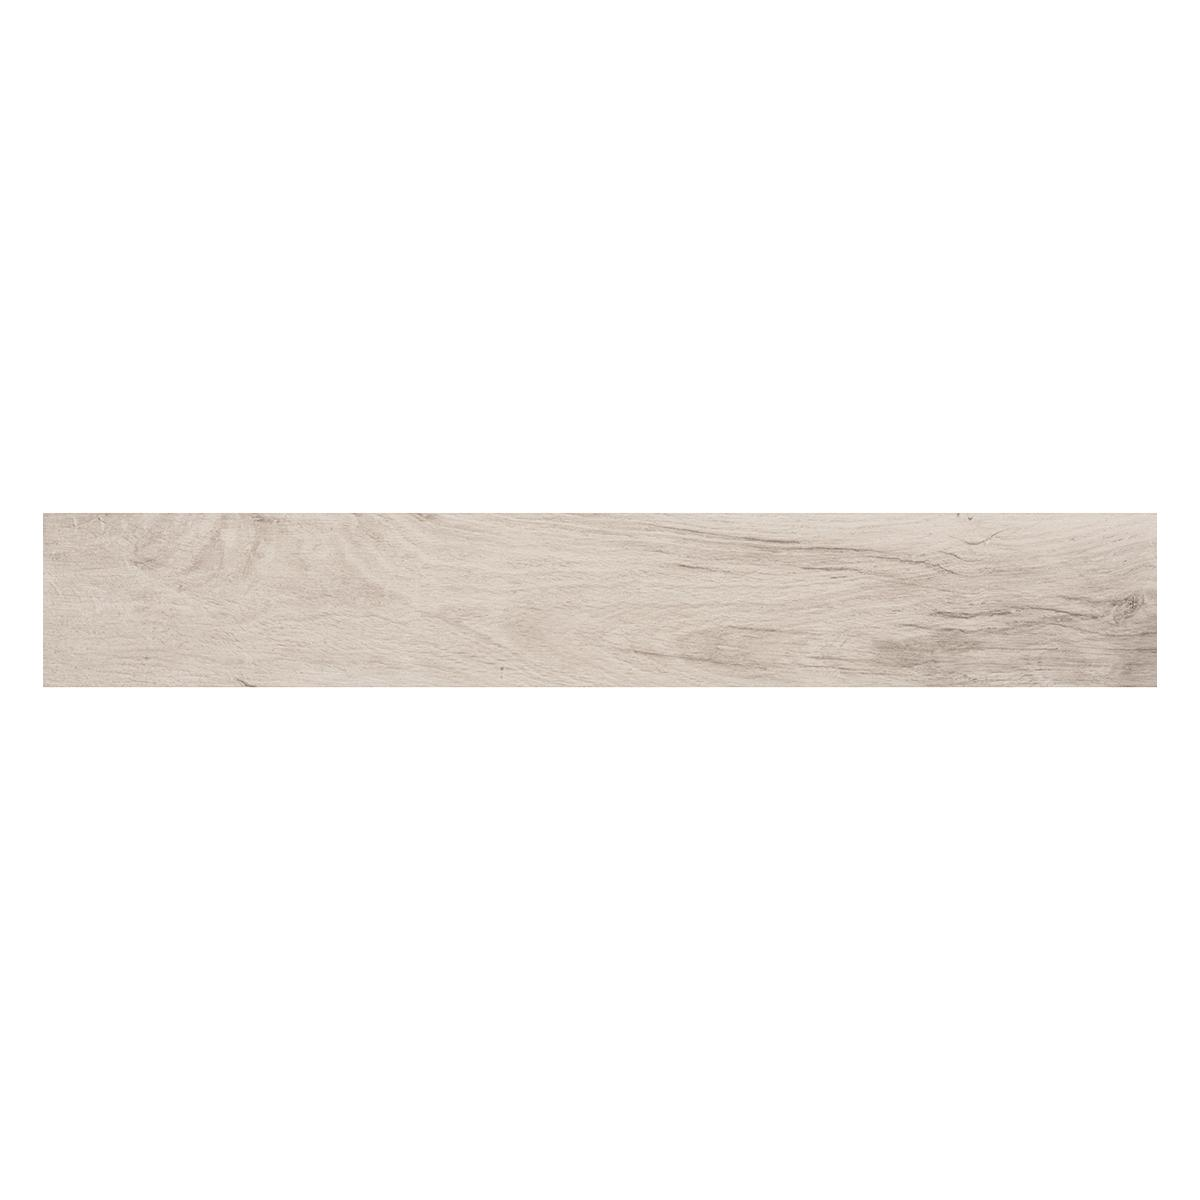 Porcelanato Feelwood White Natural Rectificado - 15X90 cm - 0.94 m2